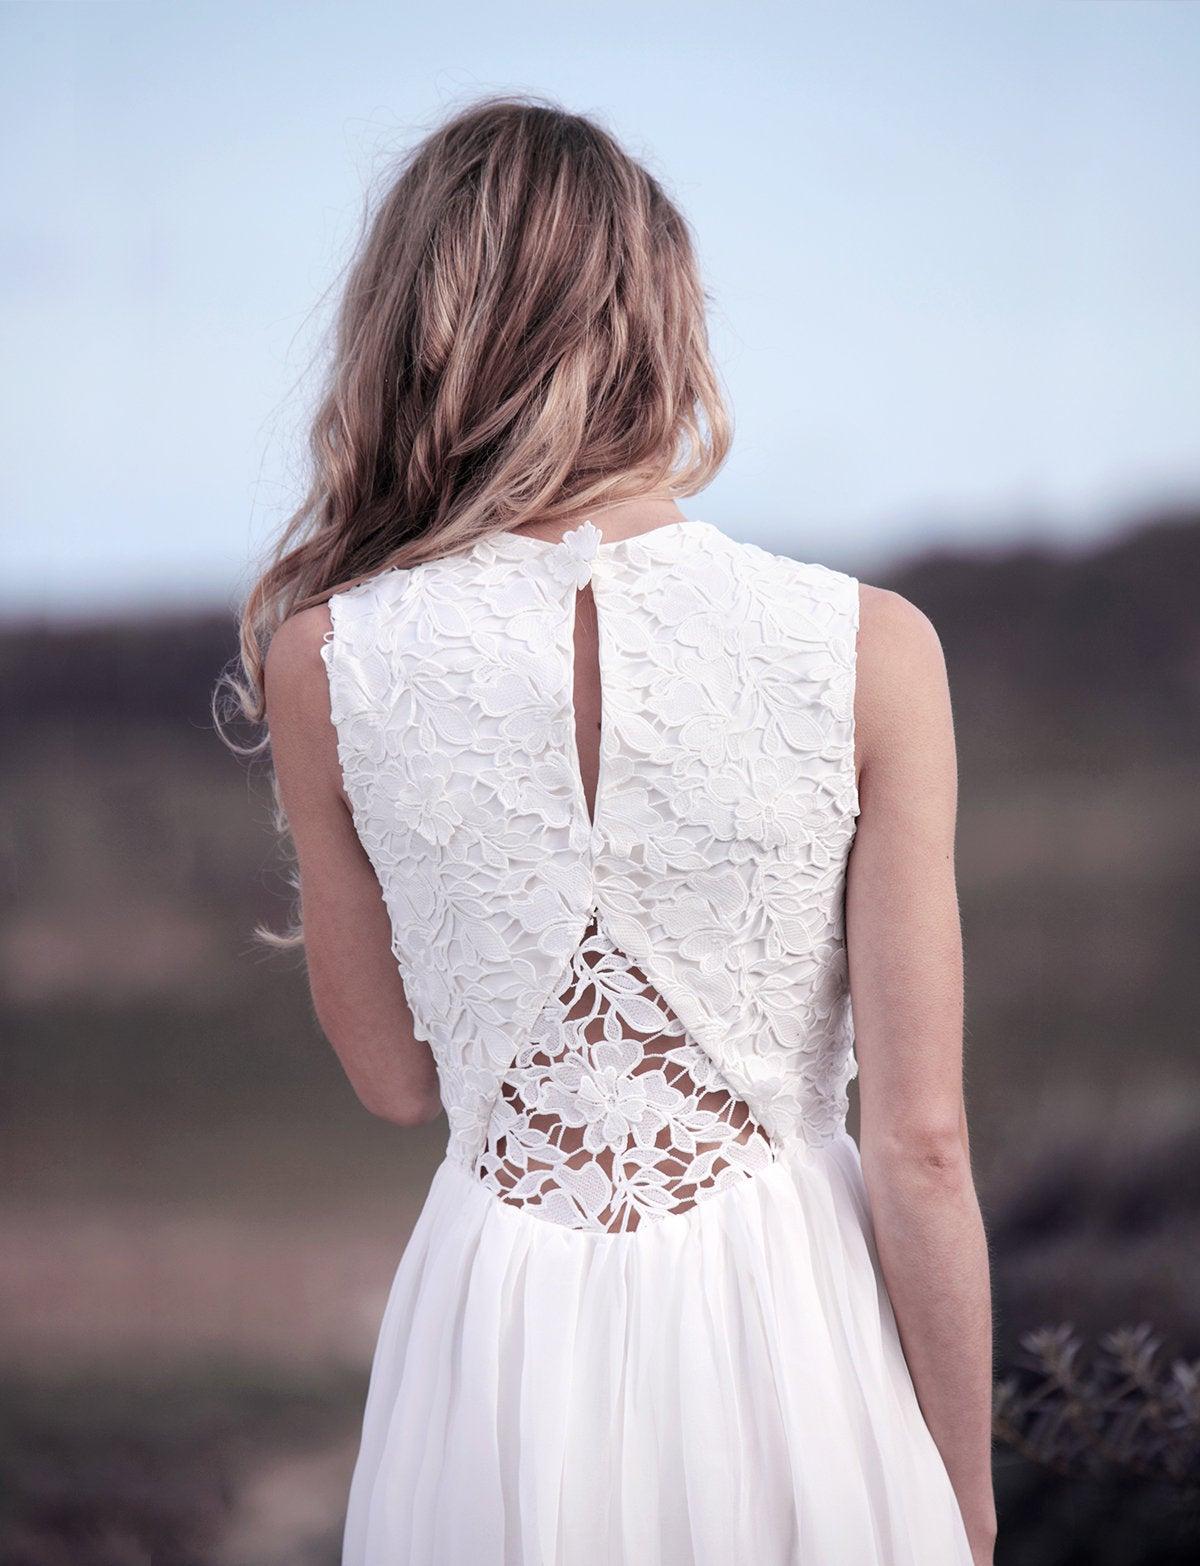 Lace wedding dress, rustic wedding, wedding dress short, vintage wedding, bridal lace dress, garden wedding dress.jpg